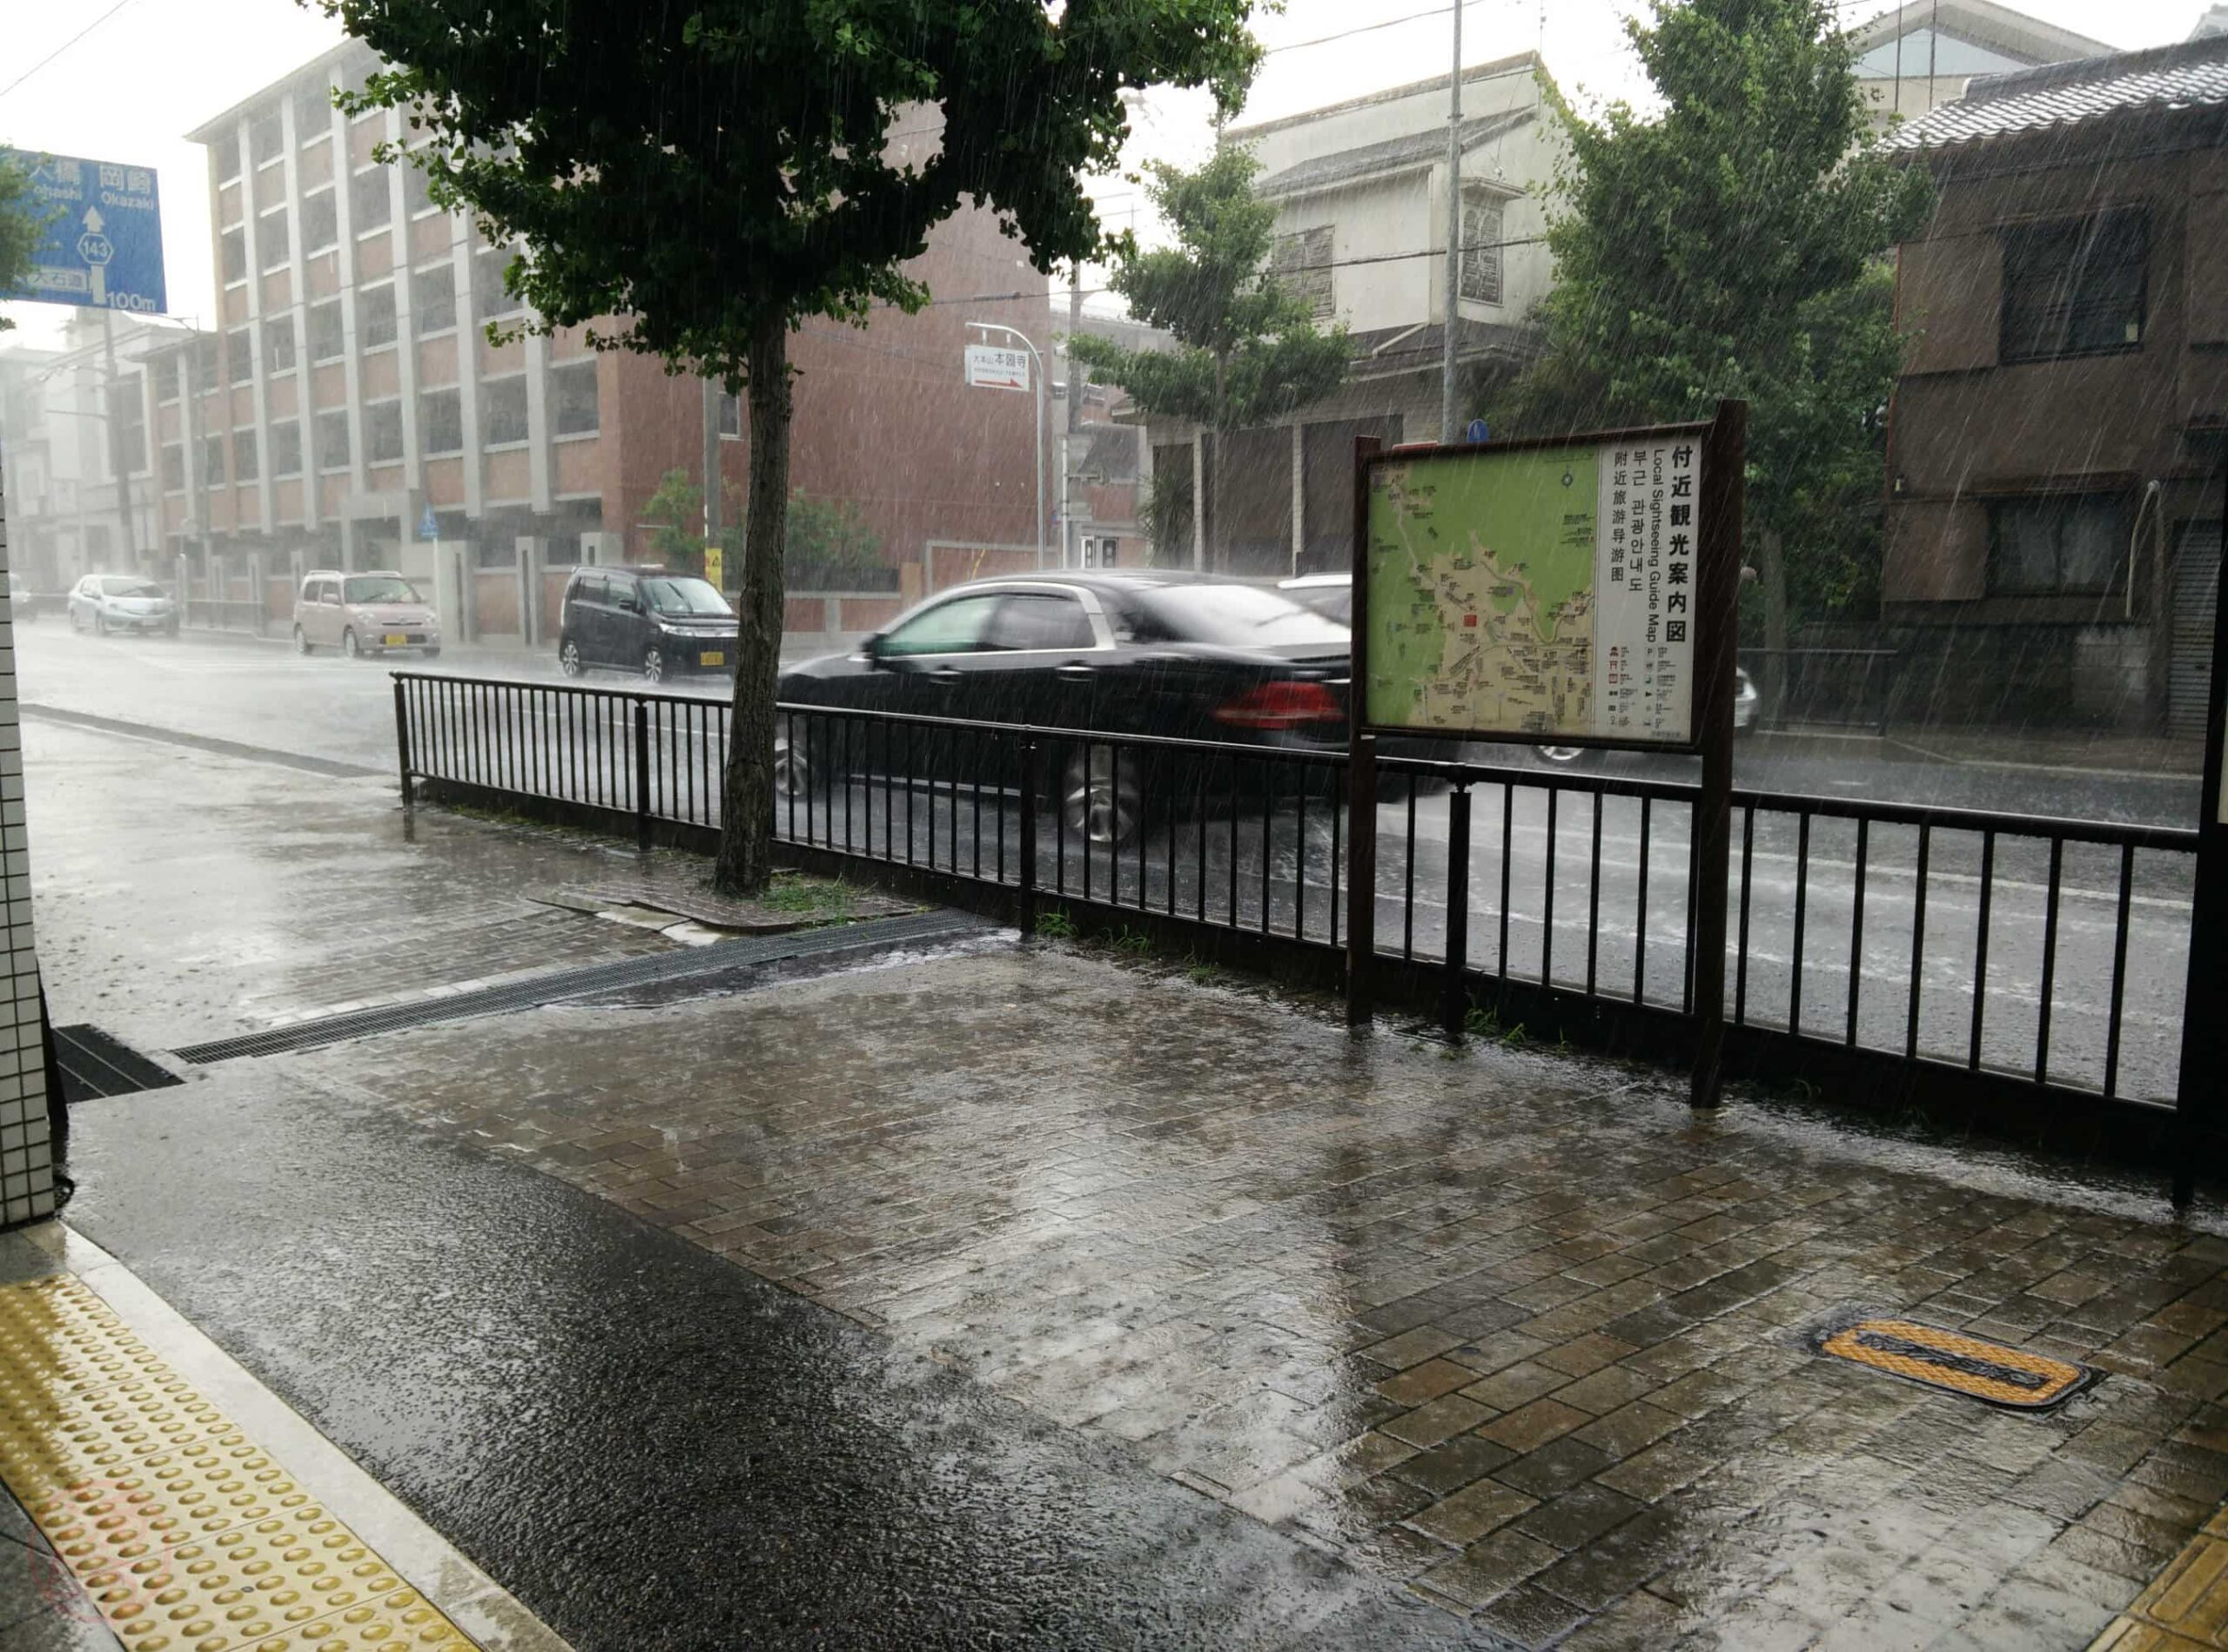 Nem mindig esik nagyon, de ha igen...